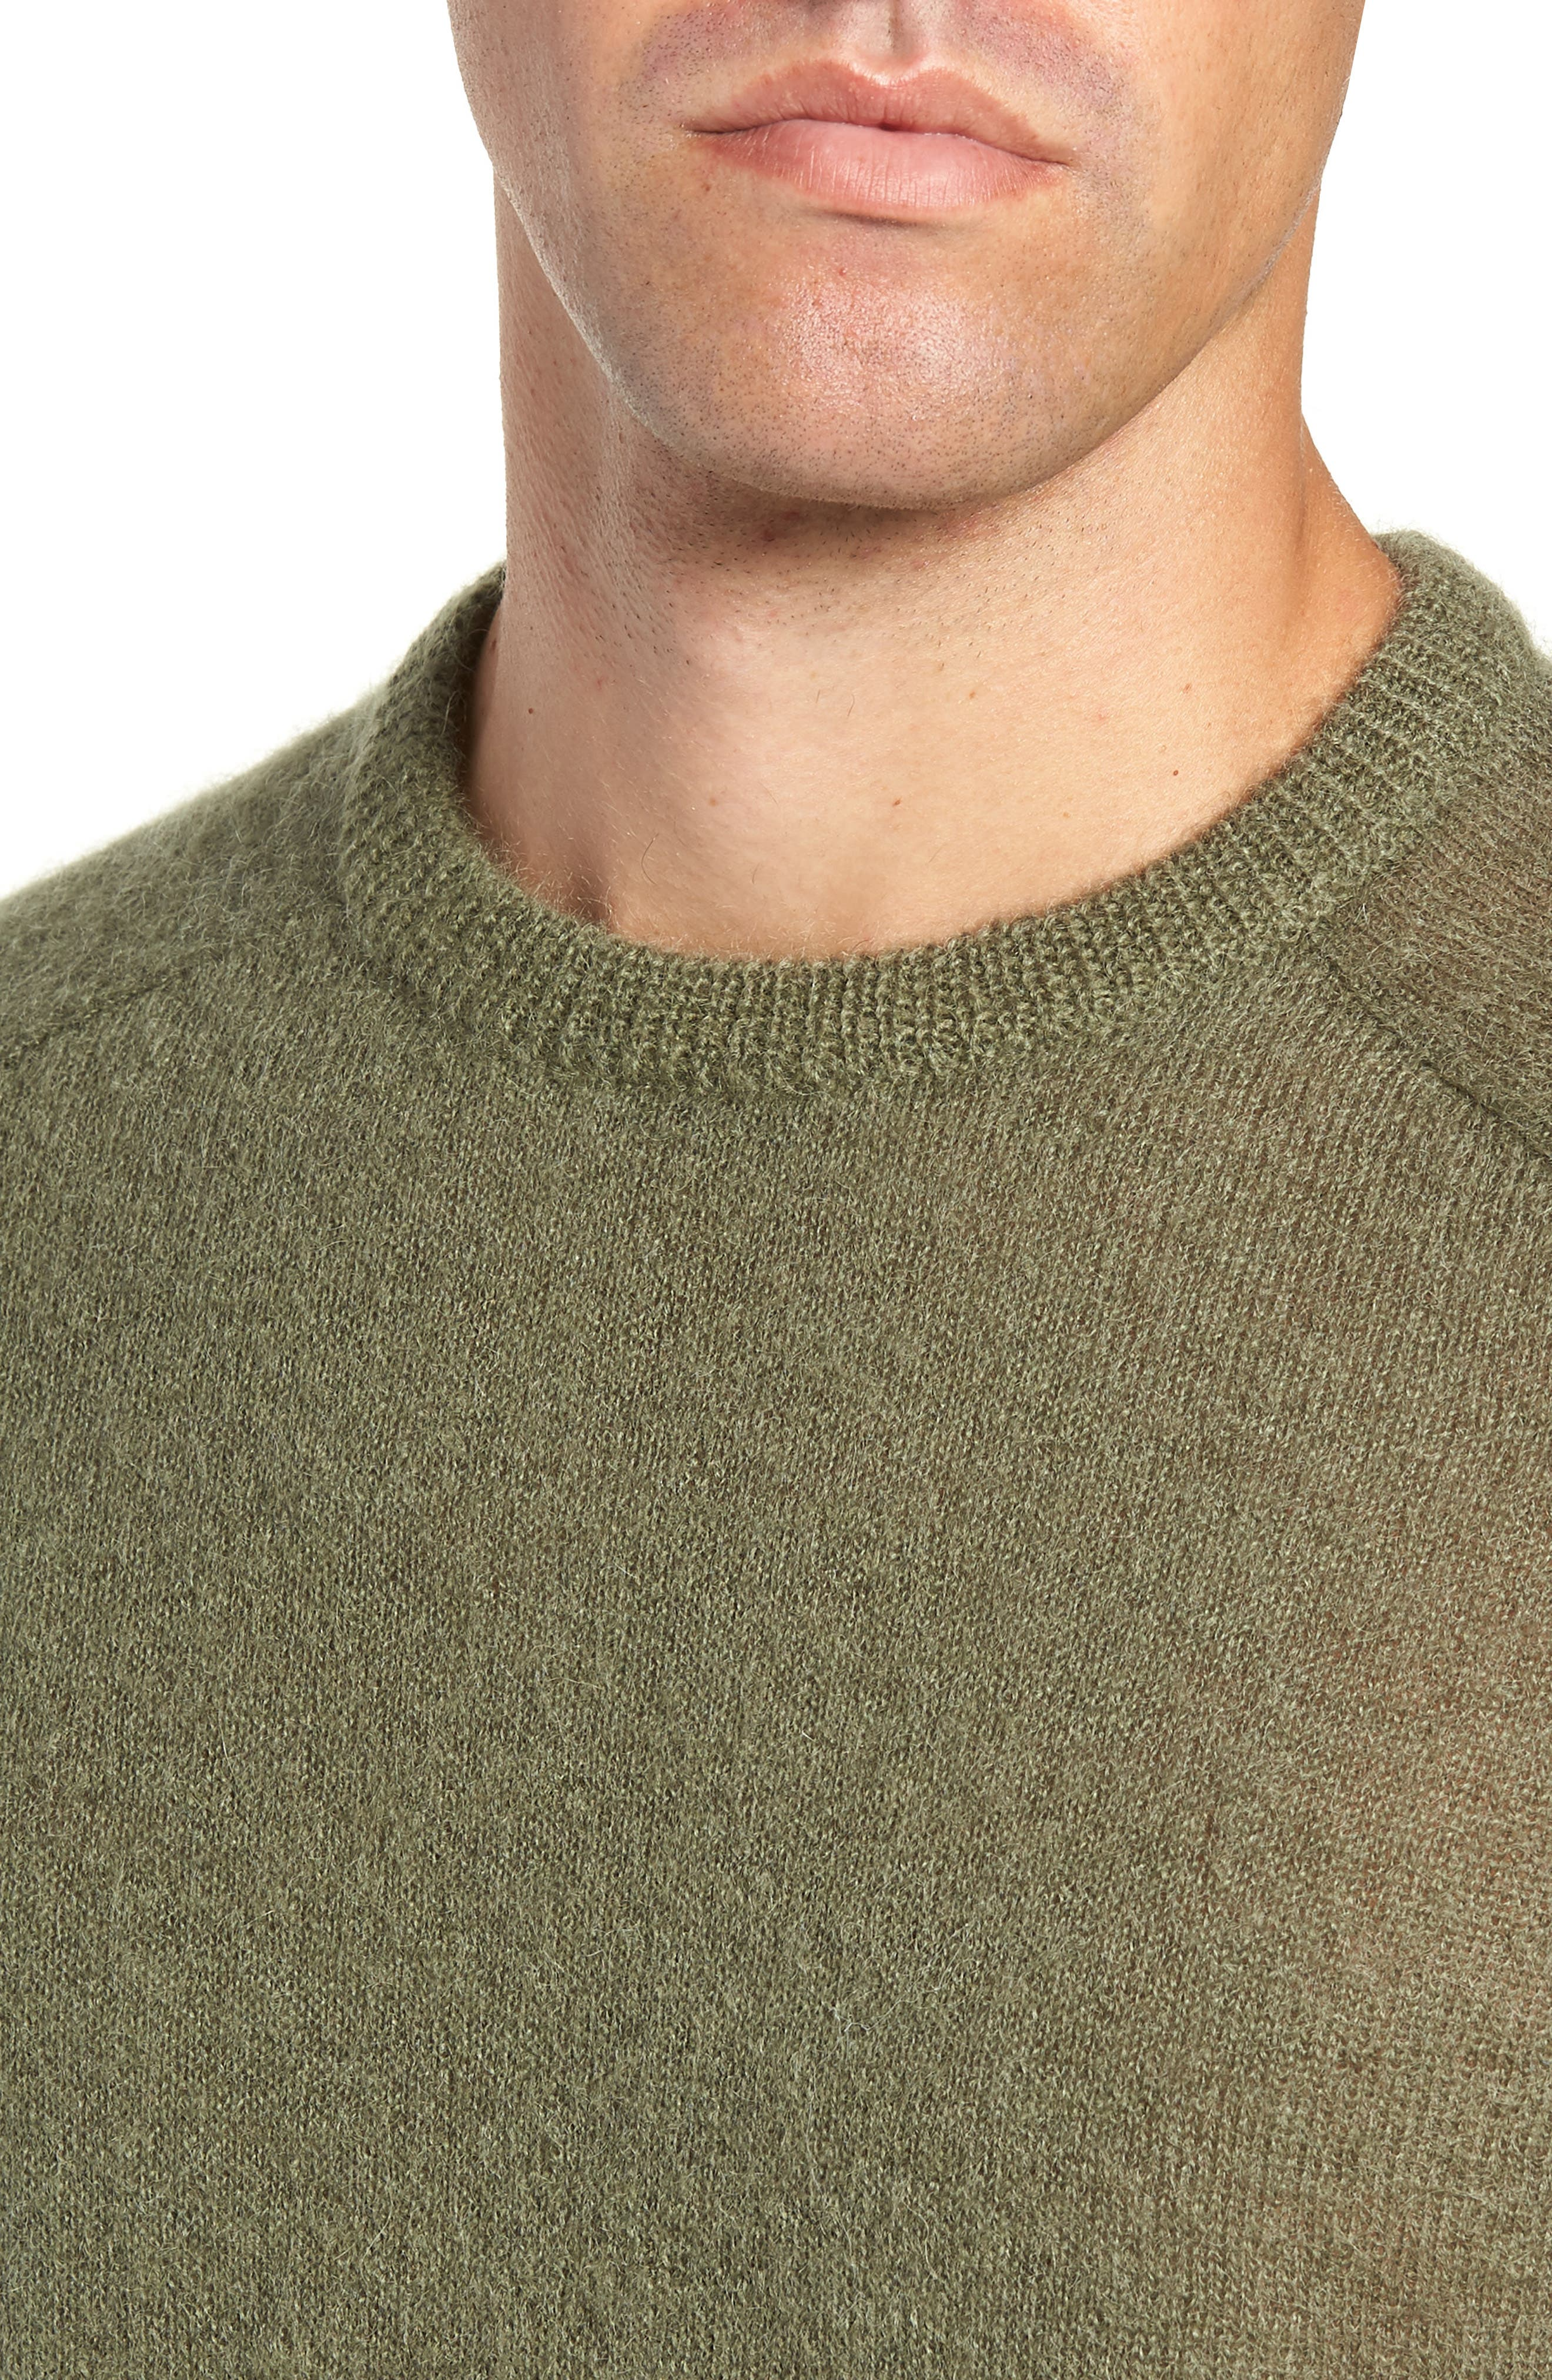 Mohair Blend Crewneck Sweater,                             Alternate thumbnail 4, color,                             340